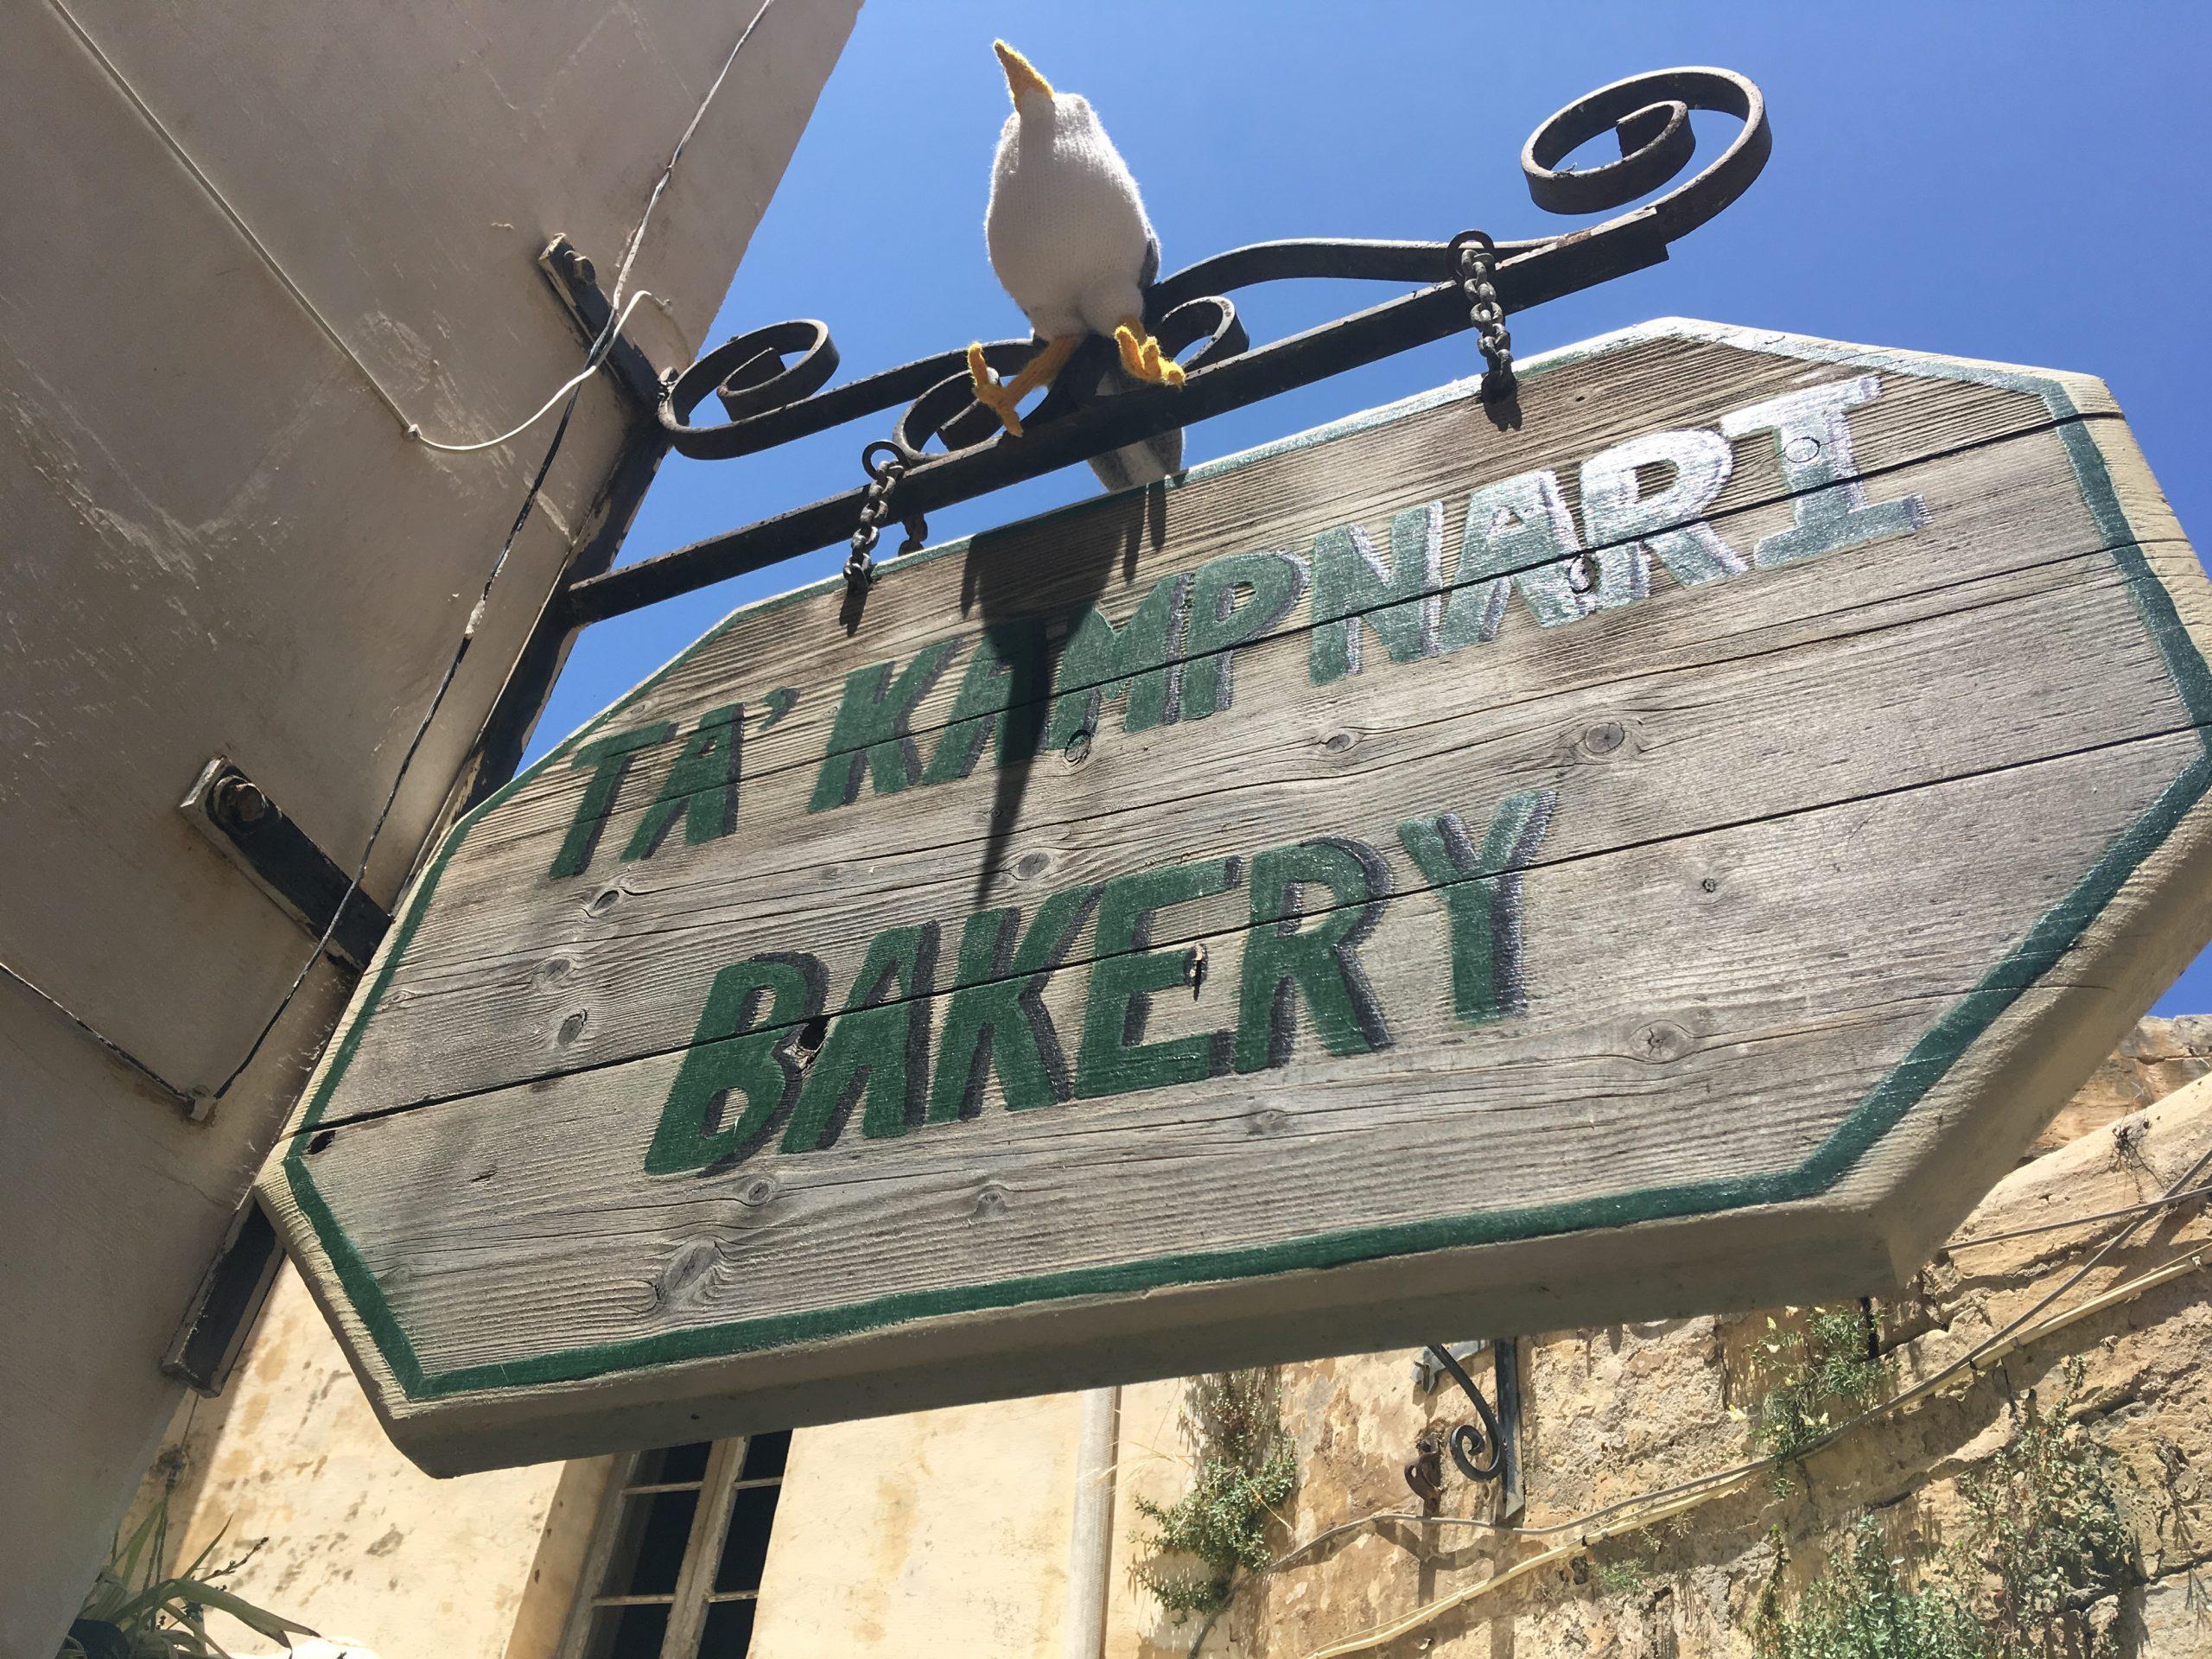 kampnari bakery gozo review